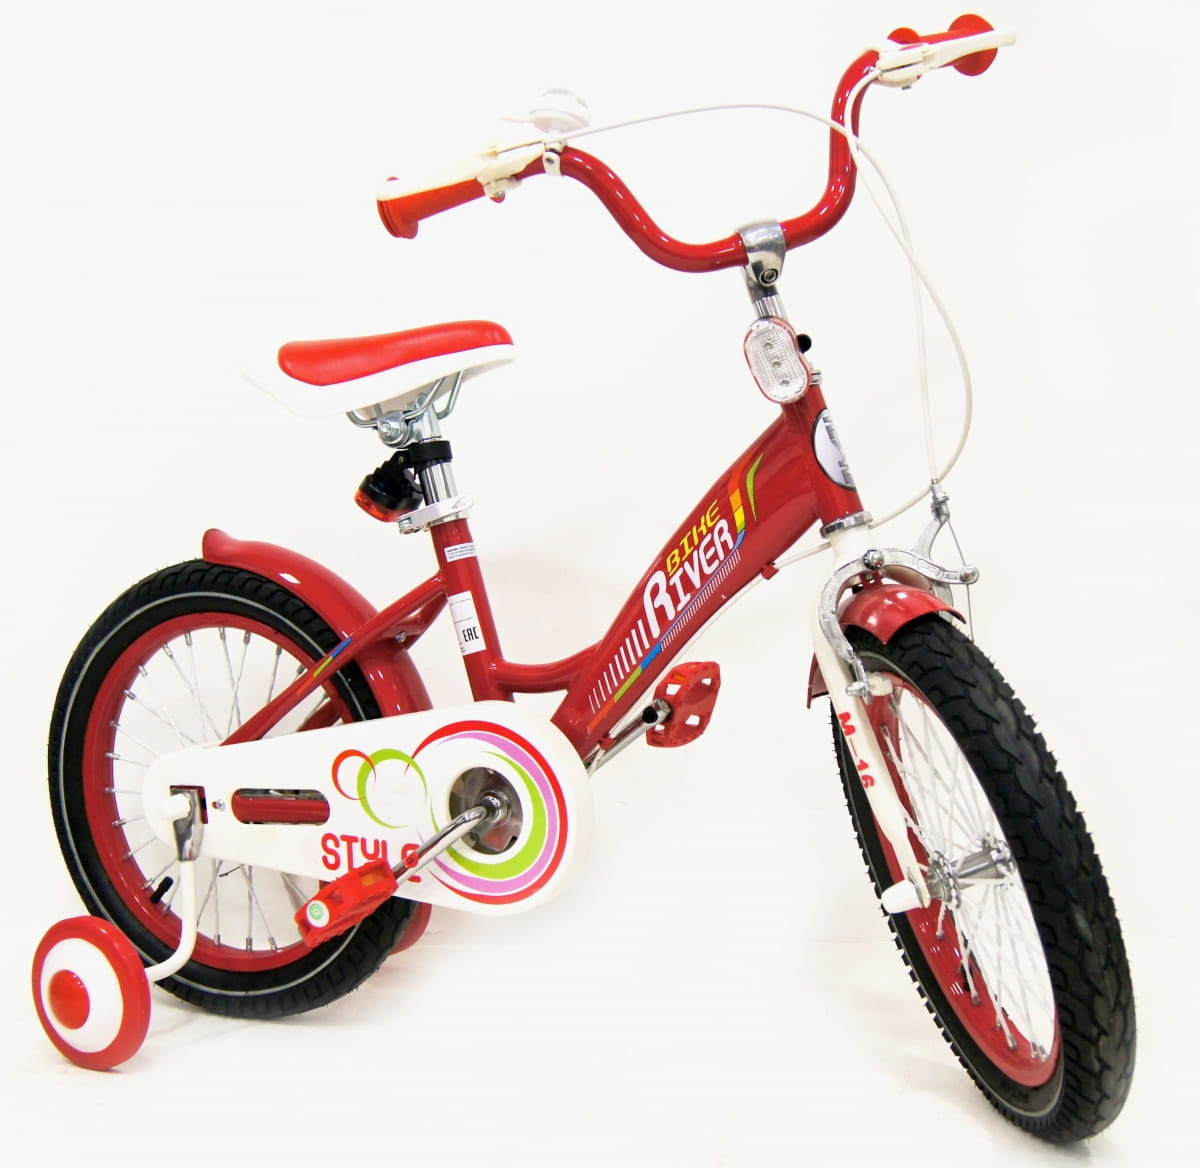 Детский велосипед Riverbike M-12 M - 12 дюймов